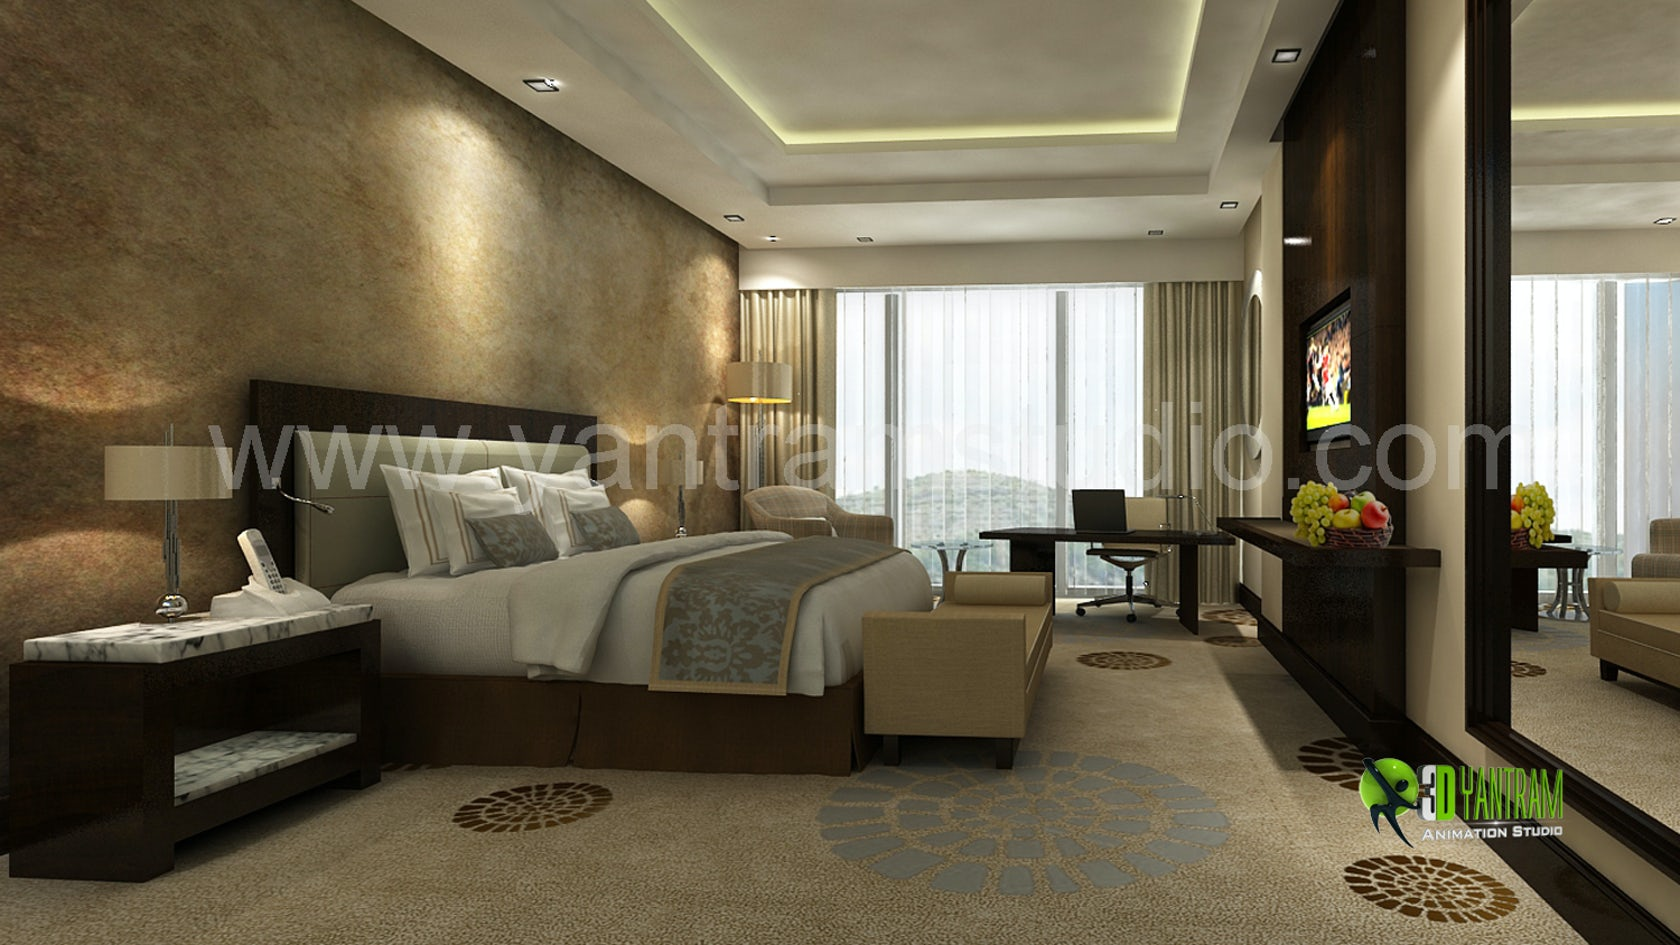 Bedroom Interior Design Architizer